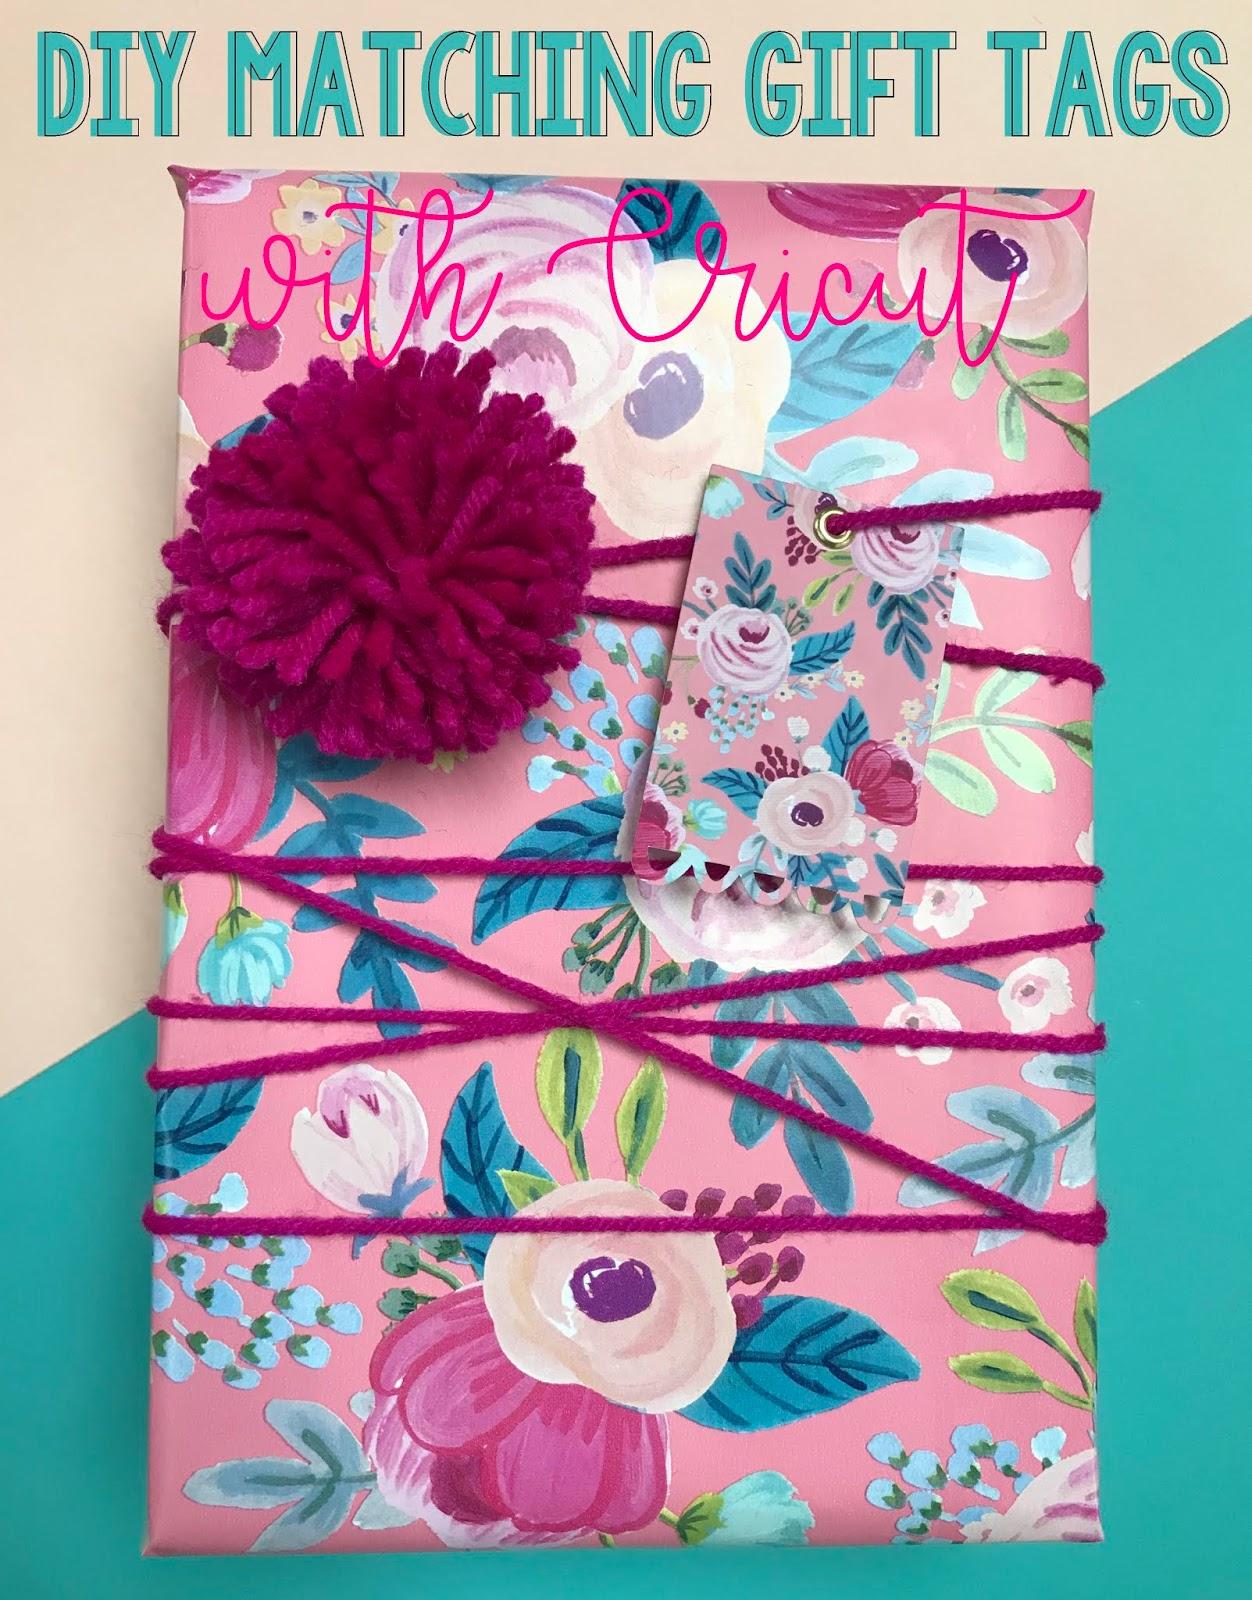 Not So Cli Shea Diy Matching Gift Tags With Cricut